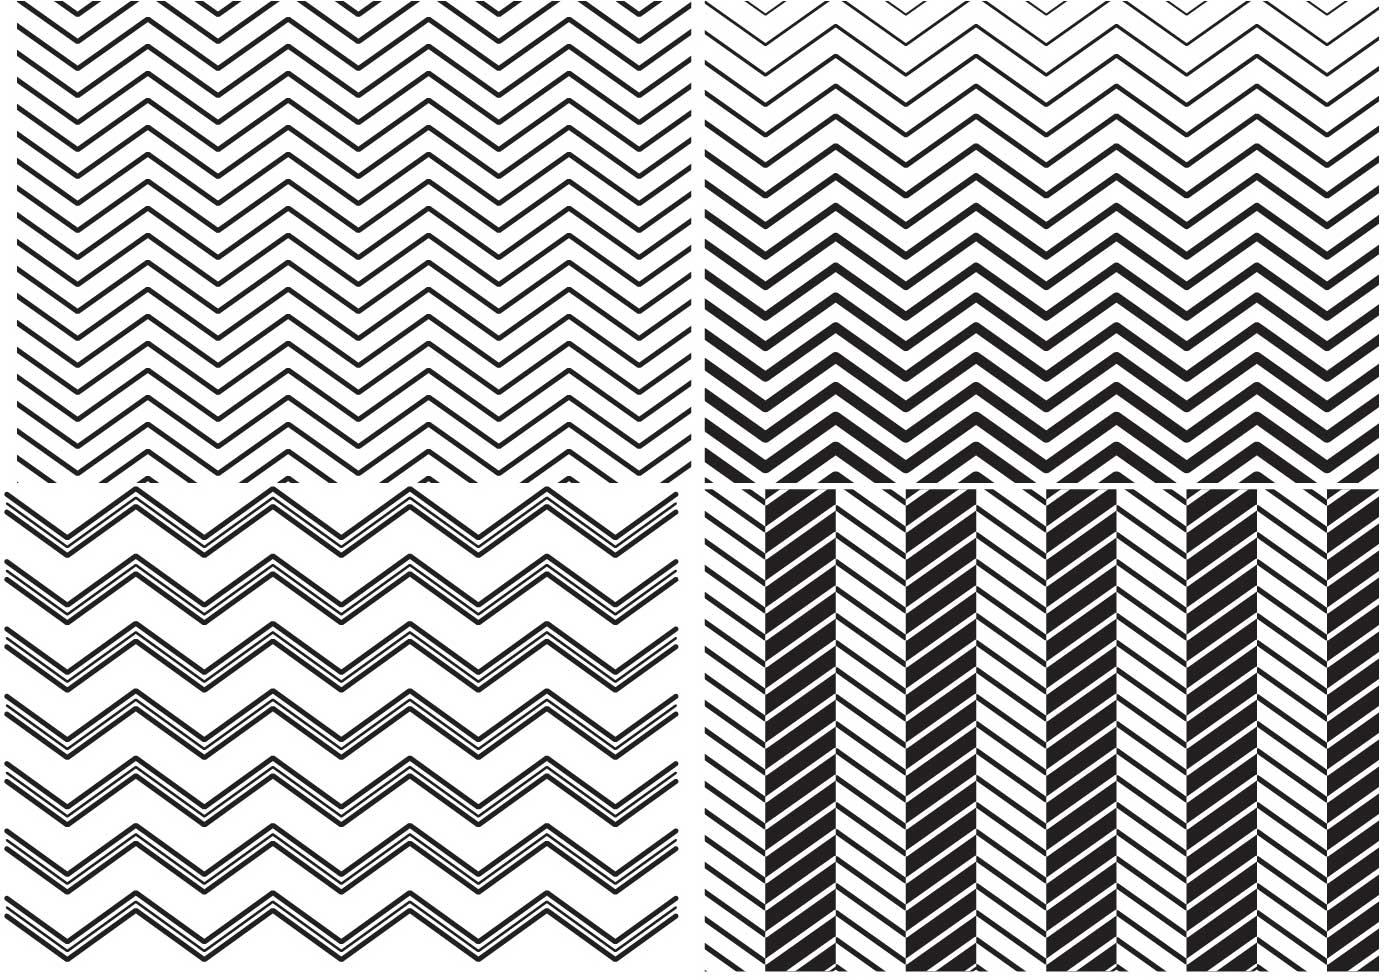 Zigzag Free Vector Art